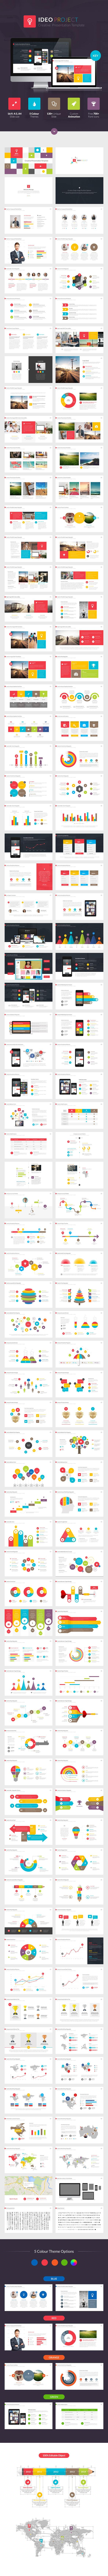 Ideo Keynote Presentation - Keynote Templates Presentation Templates